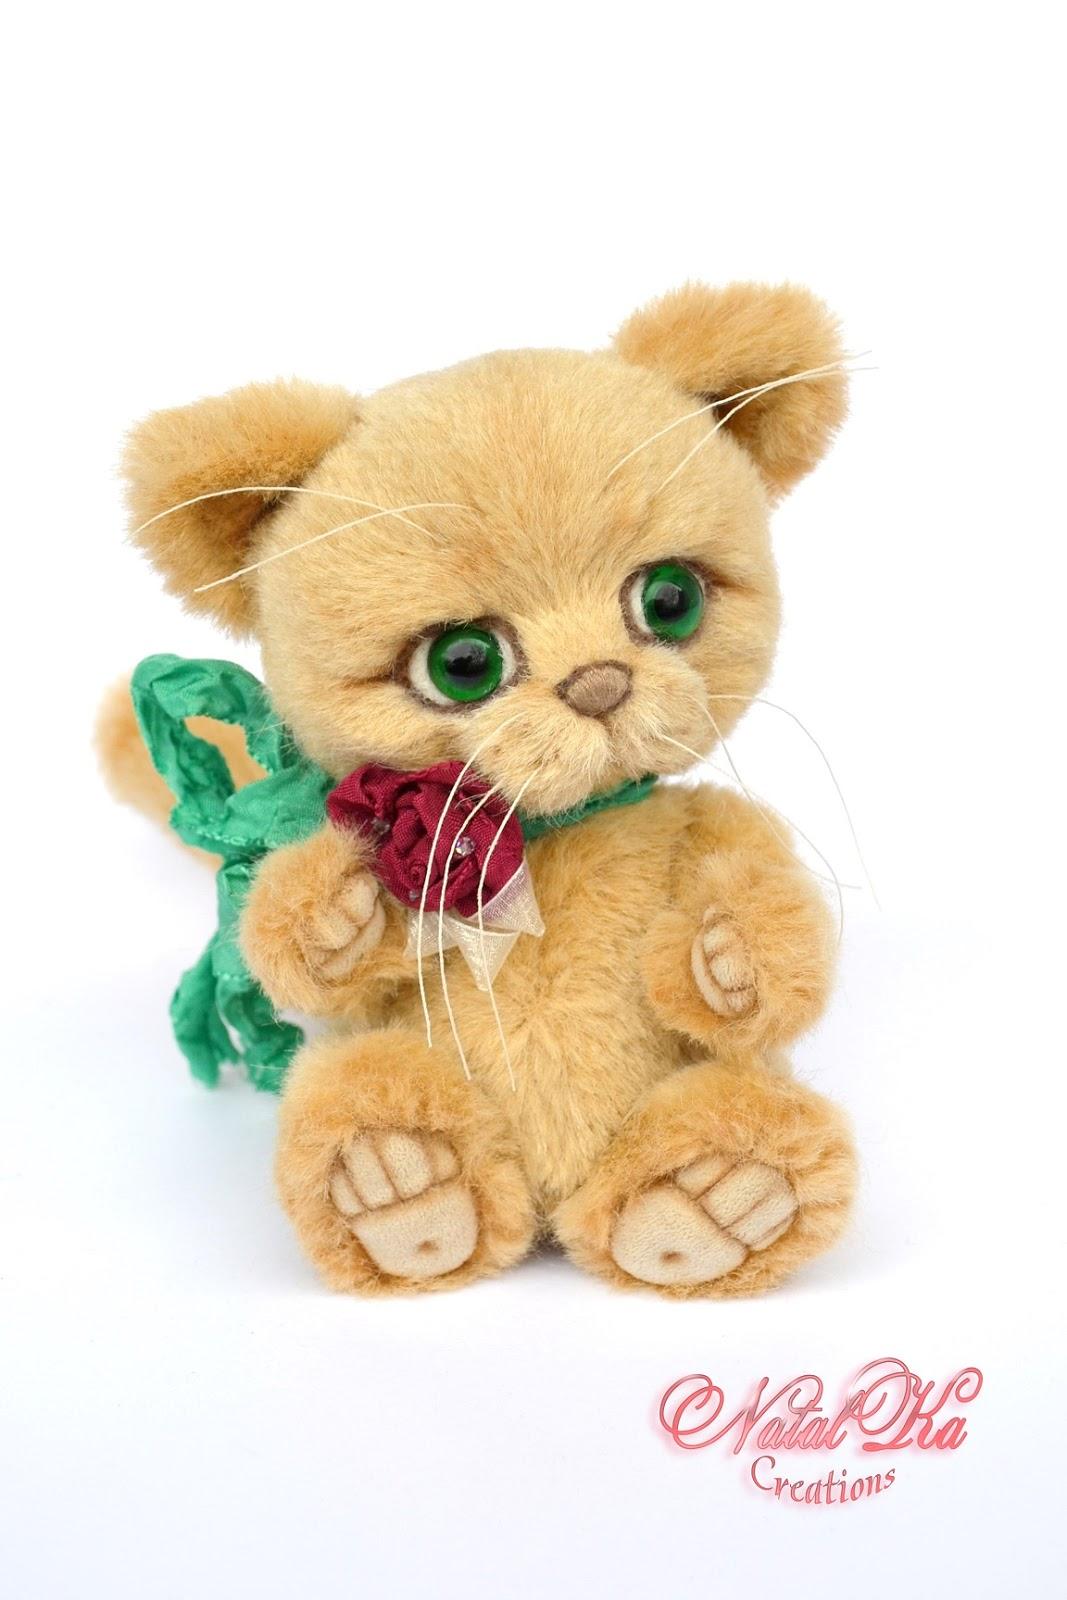 Авторский кот тедди, котенок тедди, artist teddy cat, teddy kitty, ooak teddy, handmade teddy, jointed, Künstlerteddy, Künstler Kater, Teddy Katze, handgemacht von NatalKa Creations